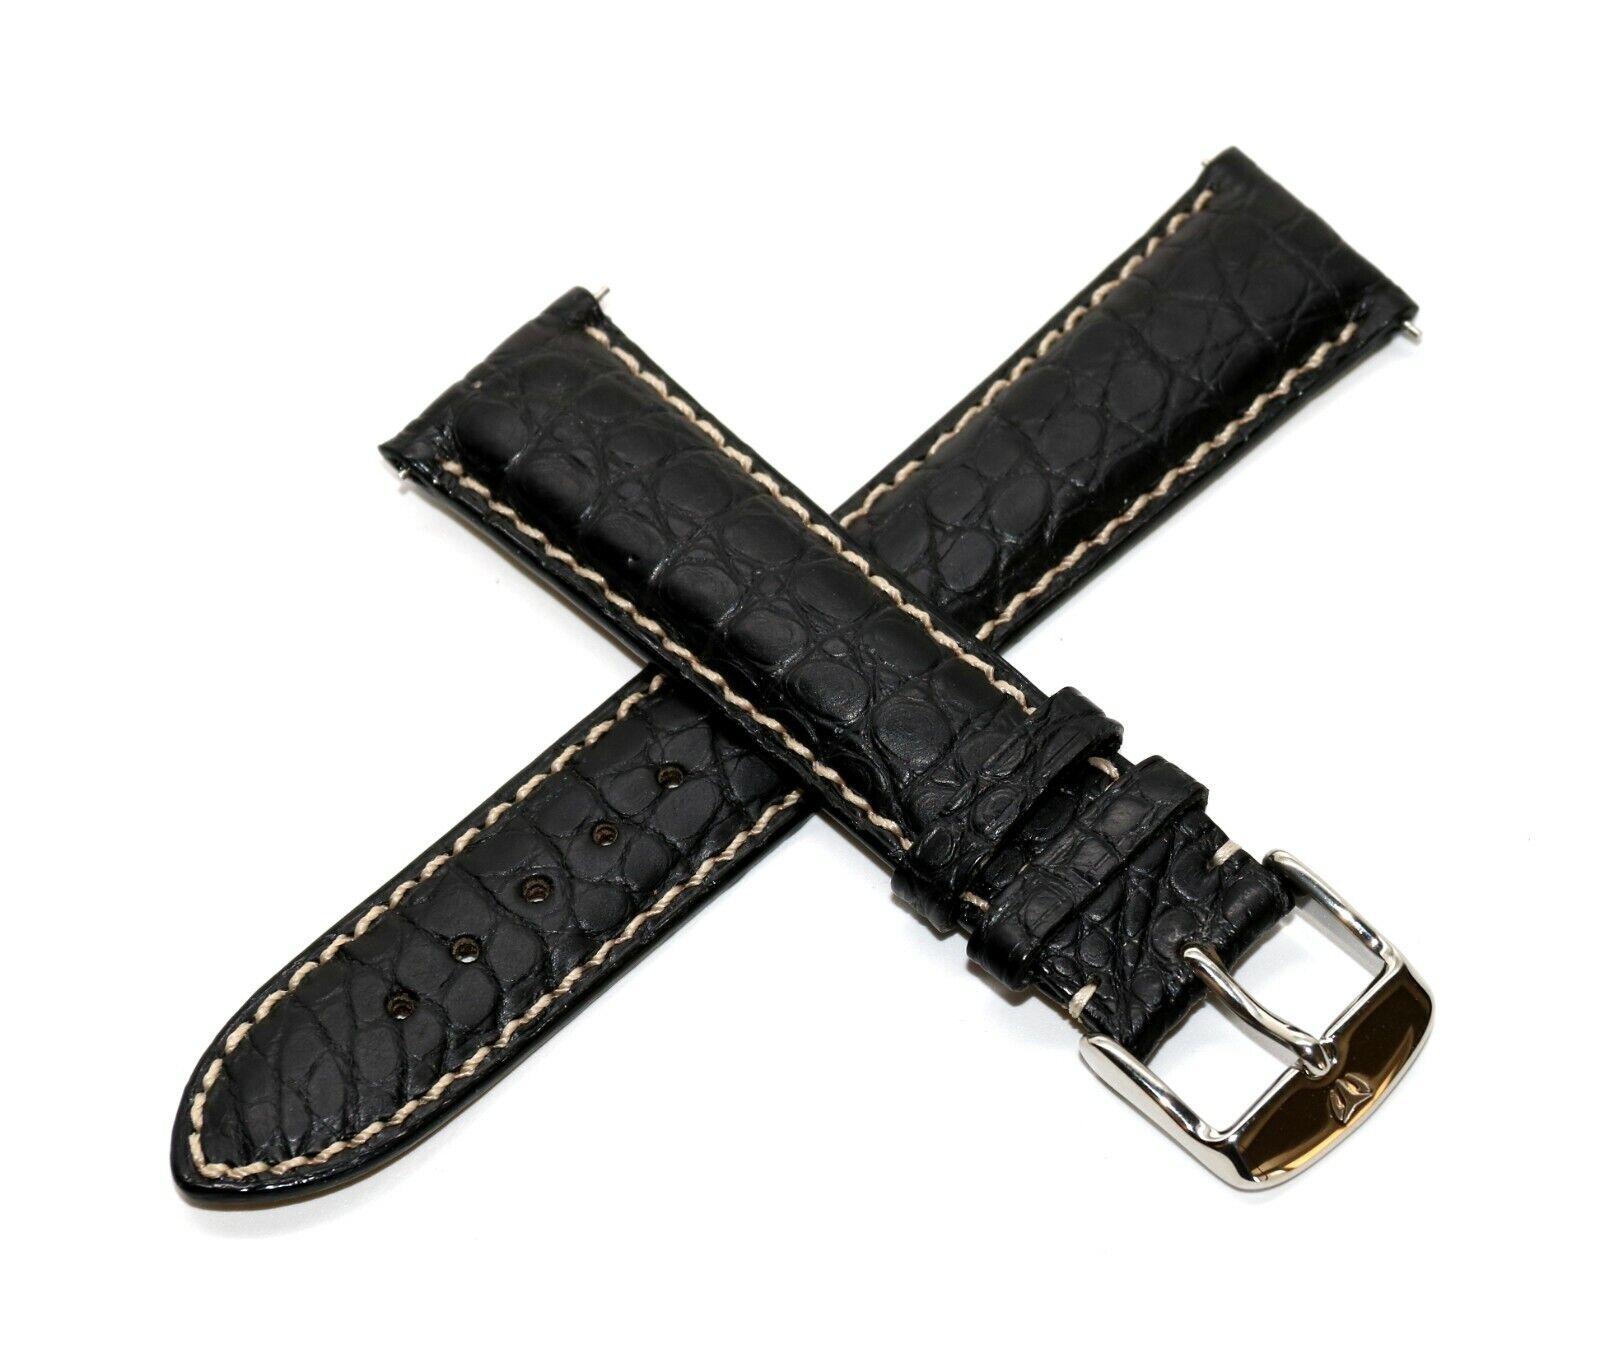 Rotary 21 mm Echt Alligator Leder Uhrenarmband Schwarz